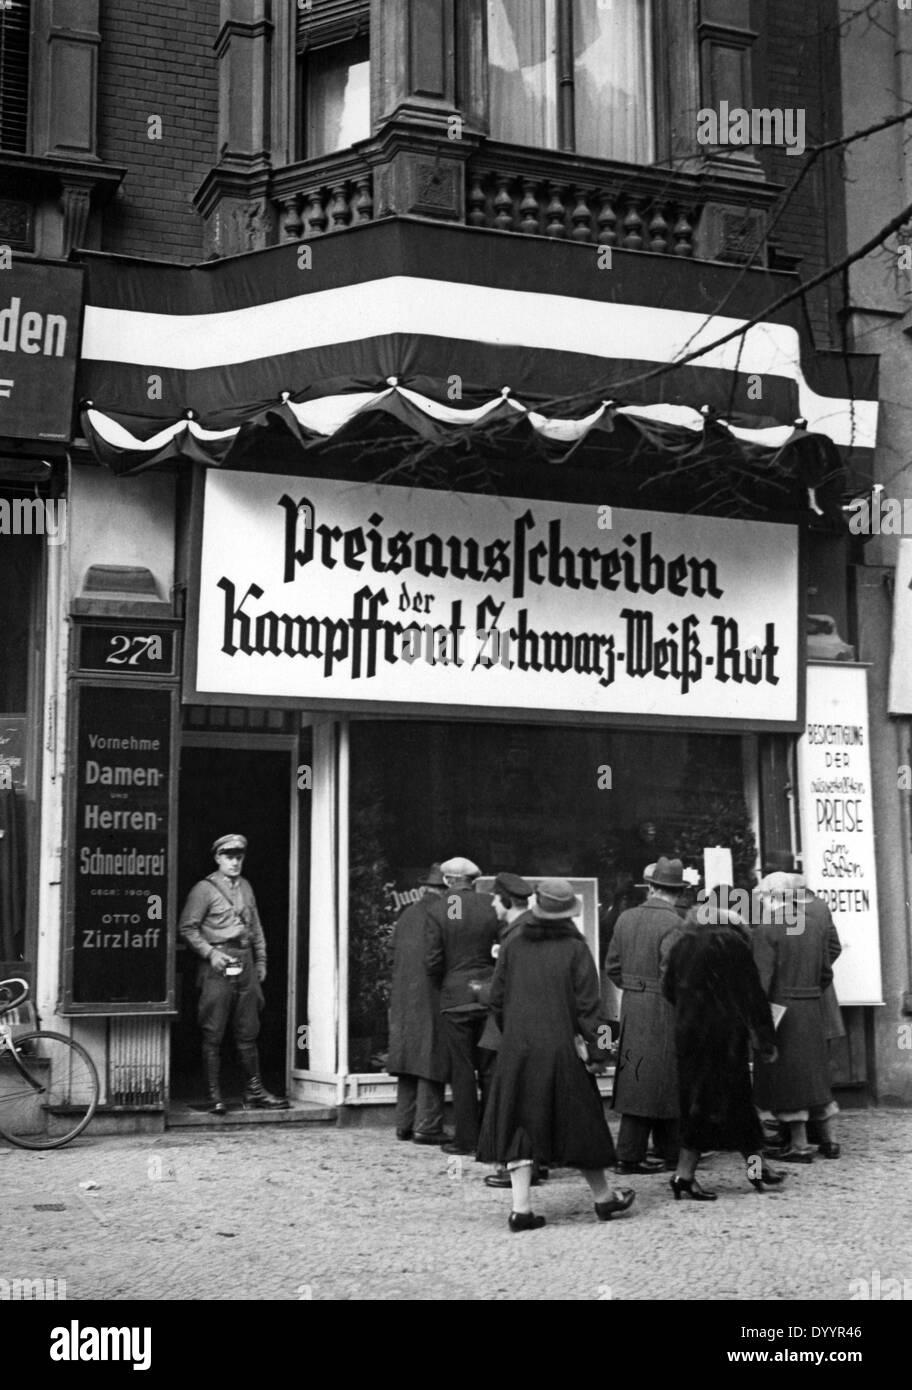 German Nationalist contest, 1933 - Stock Image